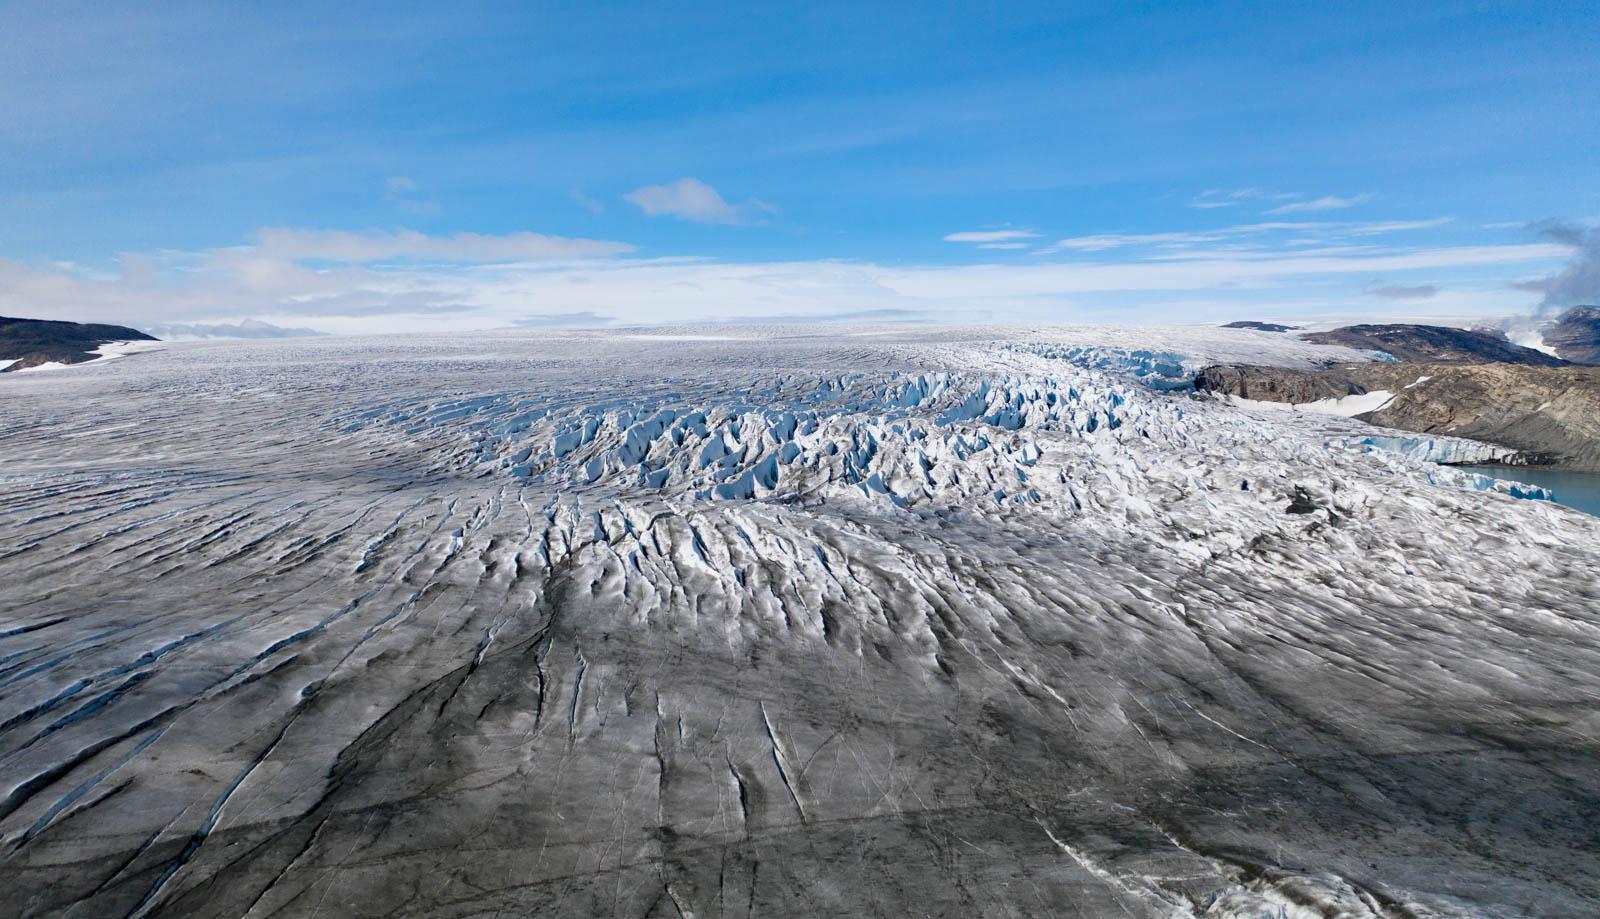 Ostgrönland, Grönland, Gletscher, Drohne, Mavic 2 Pro, Panorama, Icecap